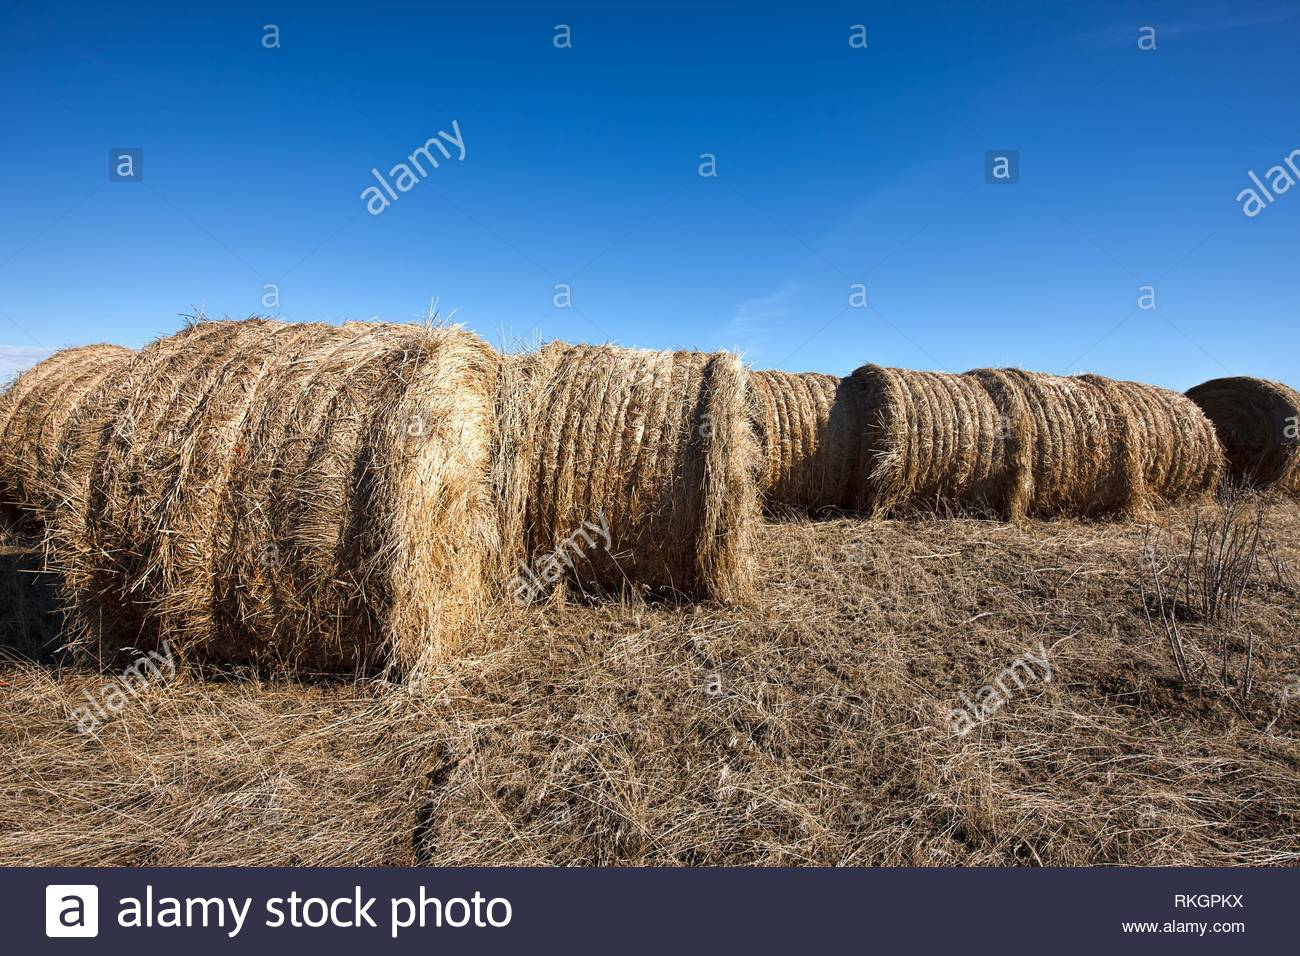 Large round hay bales sit under a clear blue sky near Davenport, Washington. - Stock Image